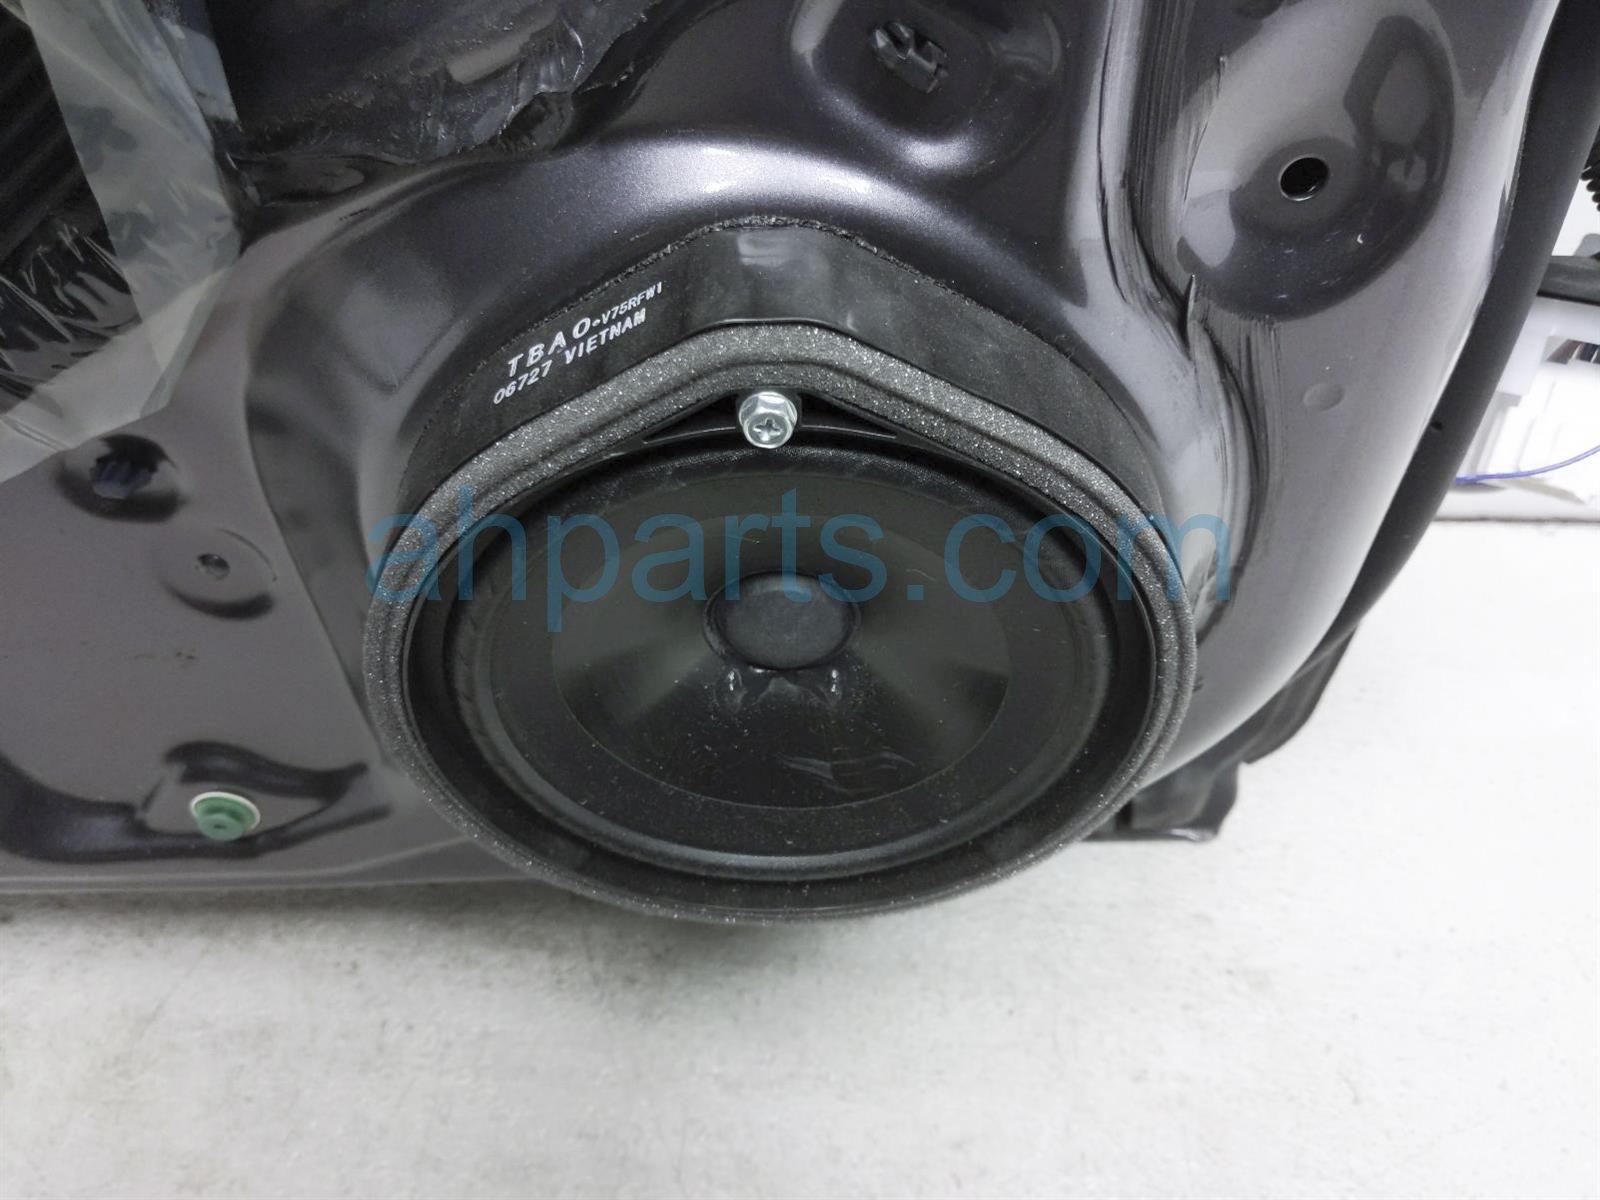 2018 Honda Clarity Front Driver Door   Grey   No Mirror/panel 67050 TRT A91ZZ Replacement